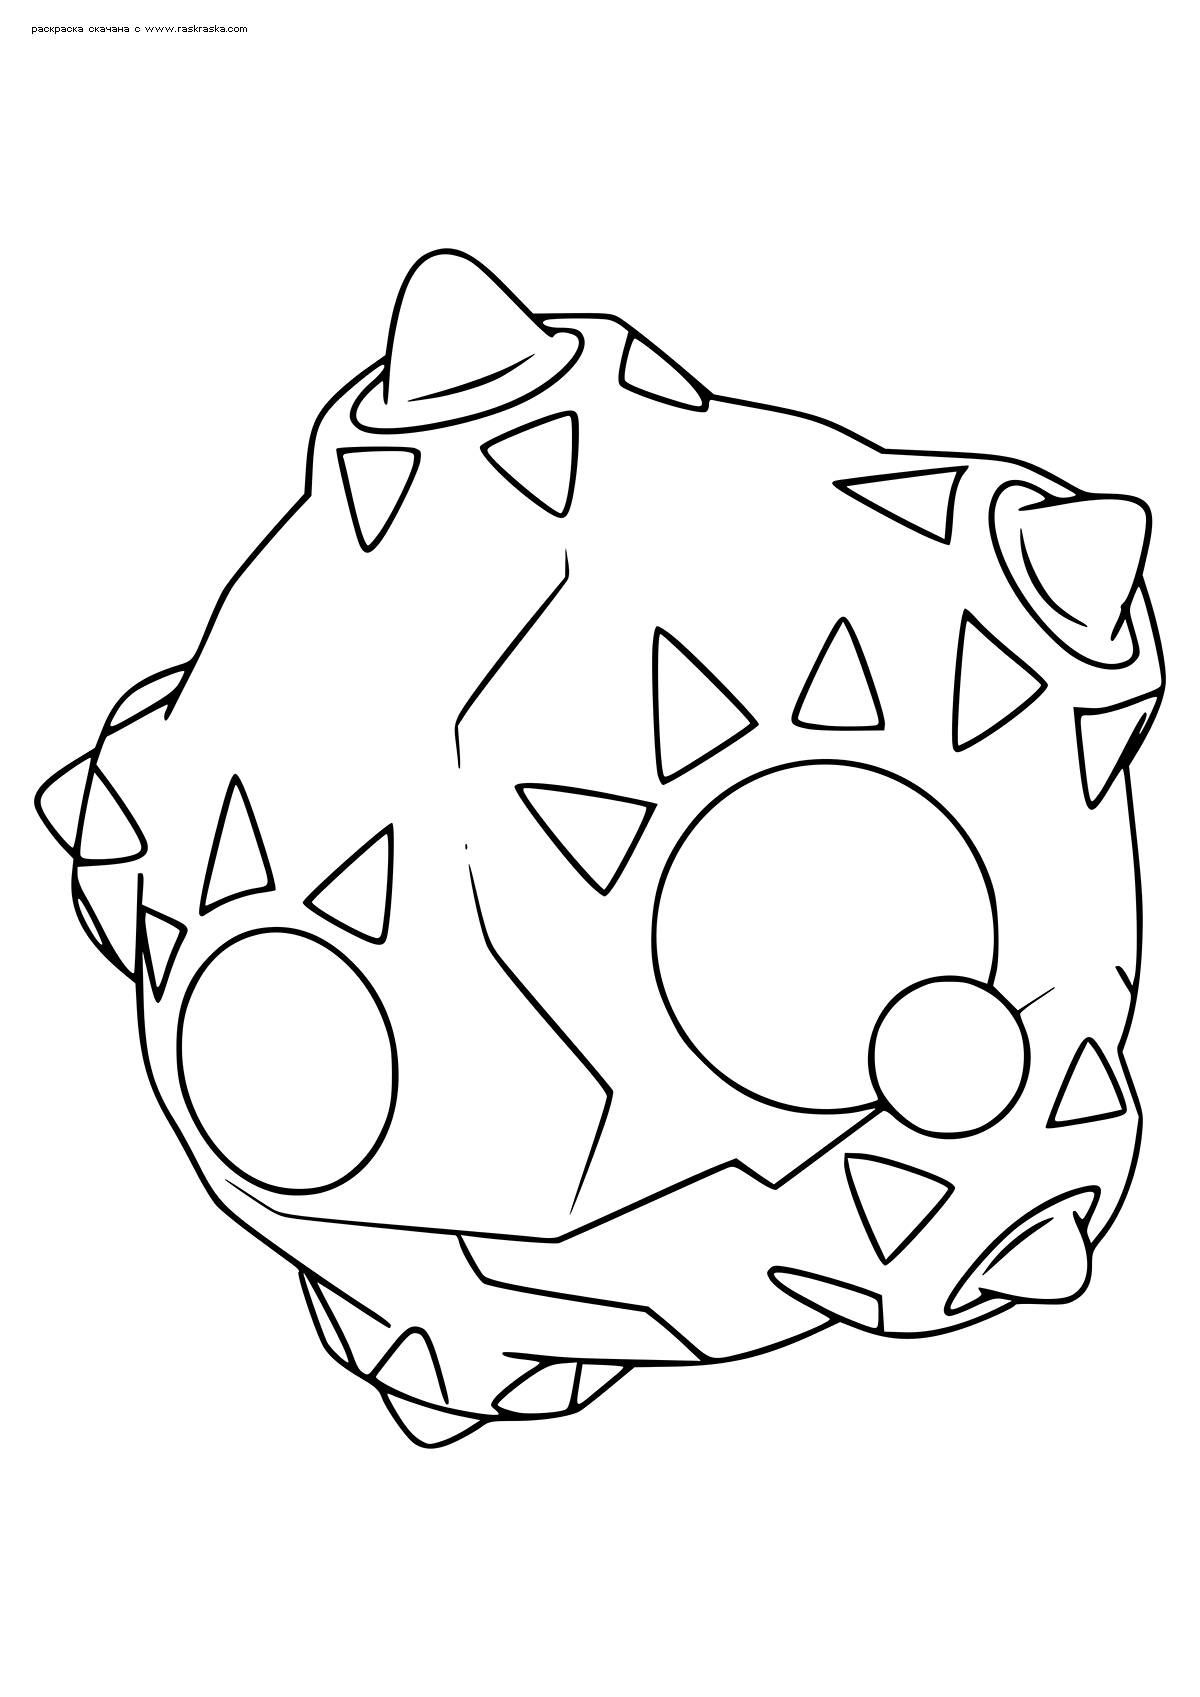 Раскраска Покемон Миниор (Minior). Раскраска Покемон